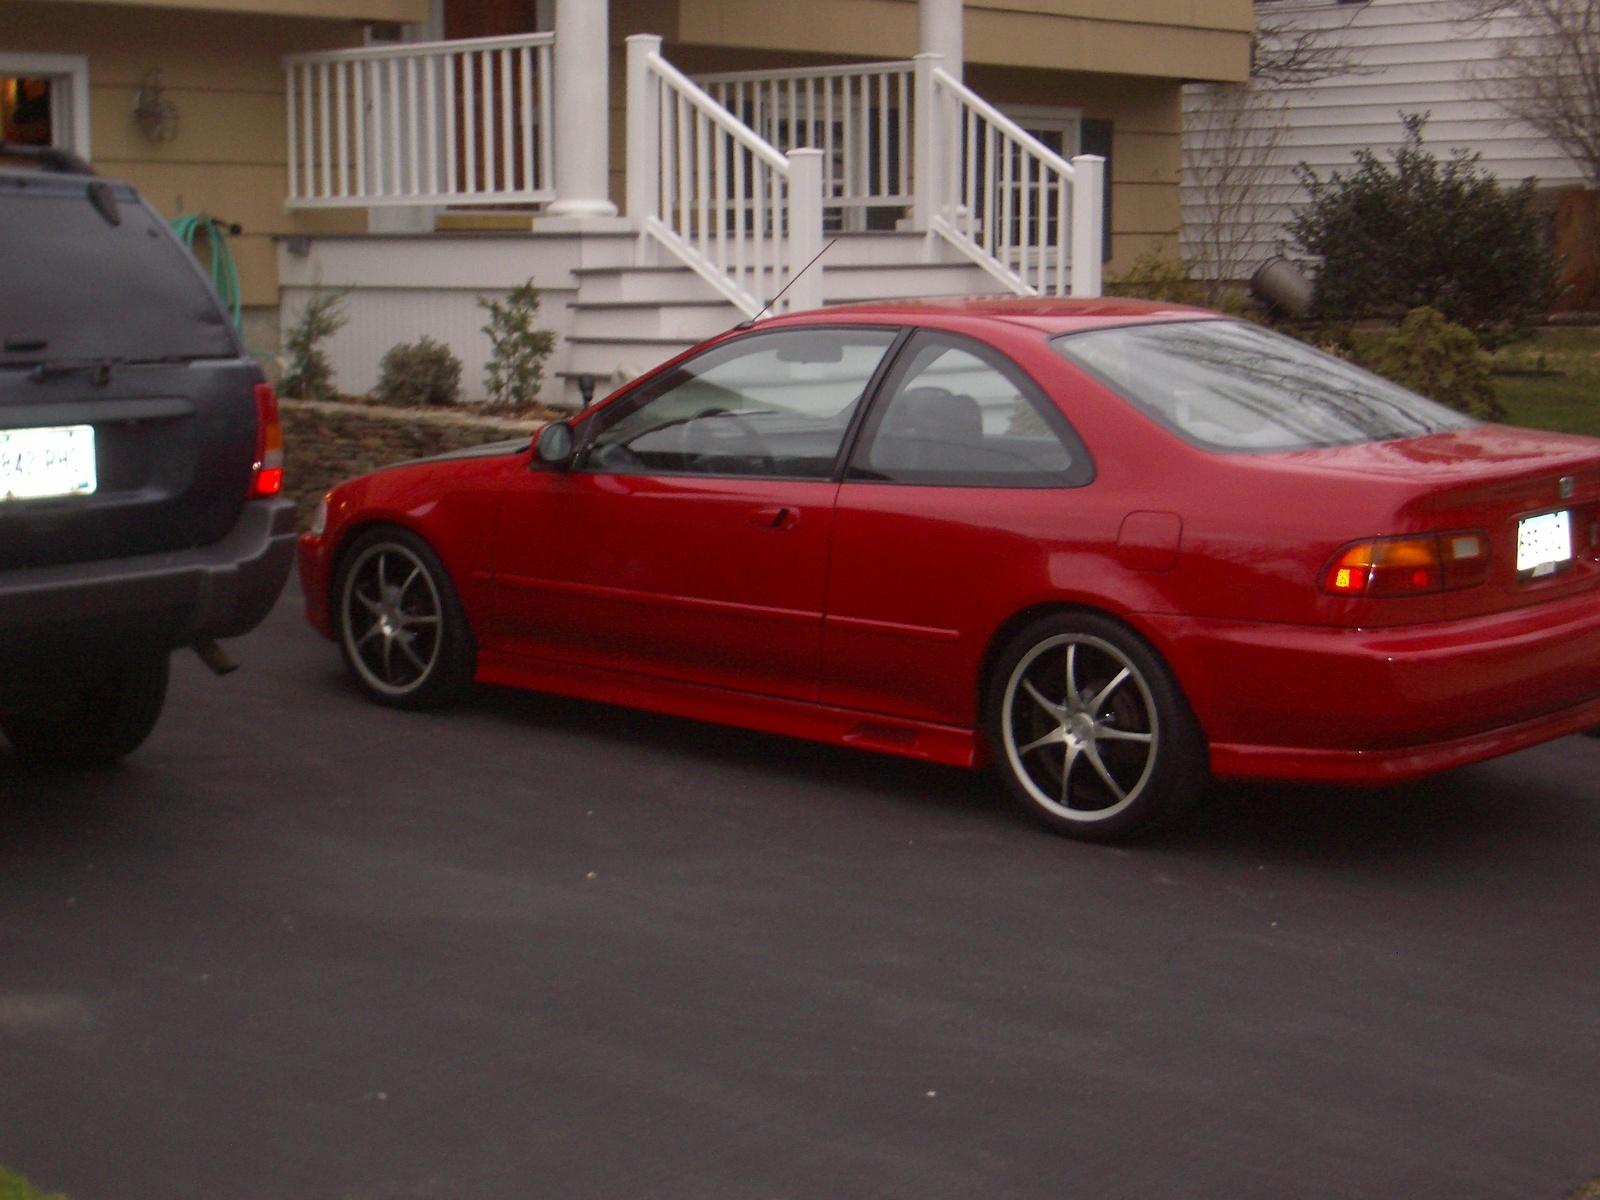 Subaru 0 Financing >> 1994 Honda Civic Coupe - Overview - CarGurus